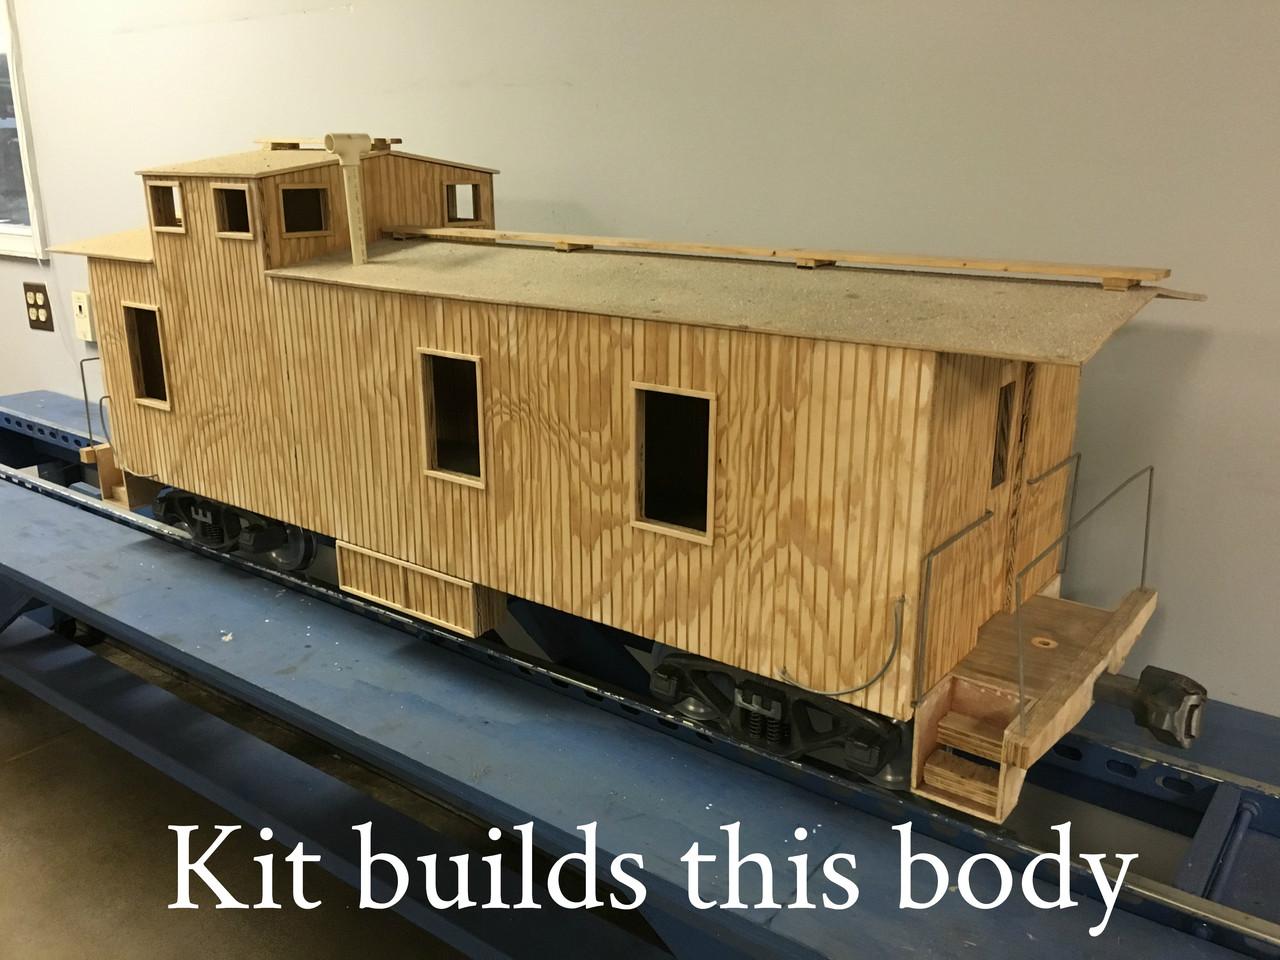 Wood Caboose End Cupola Body (Kit)